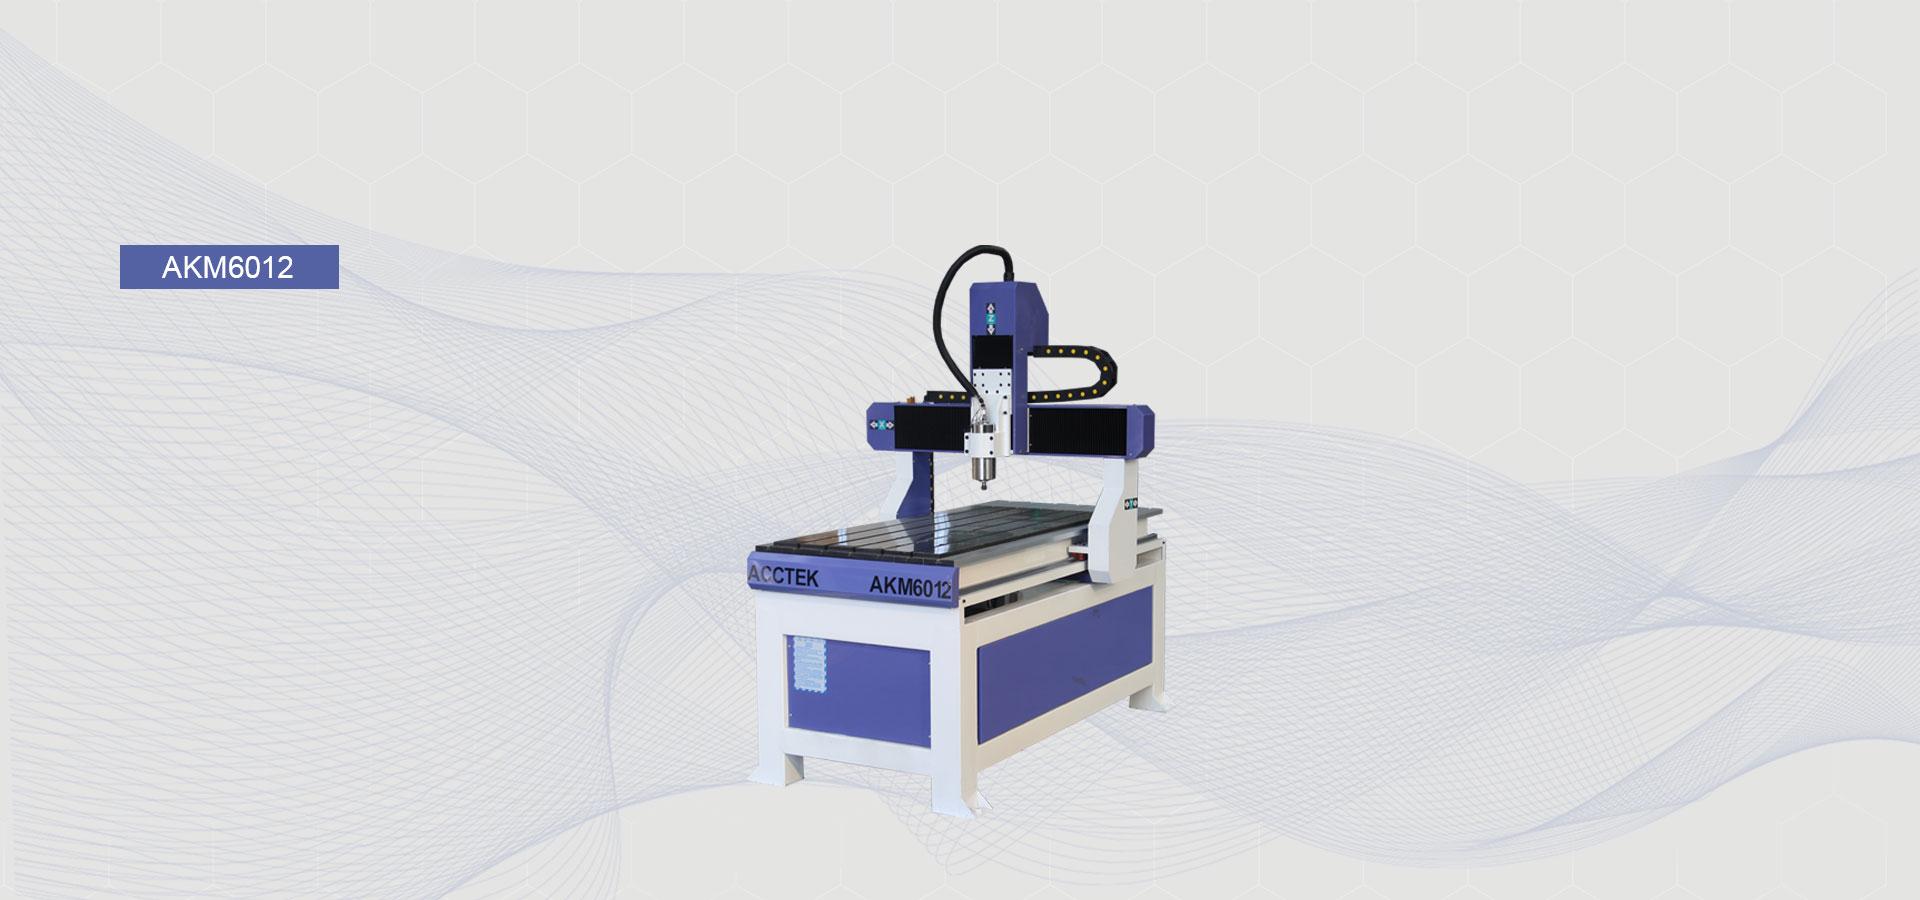 AKM6012